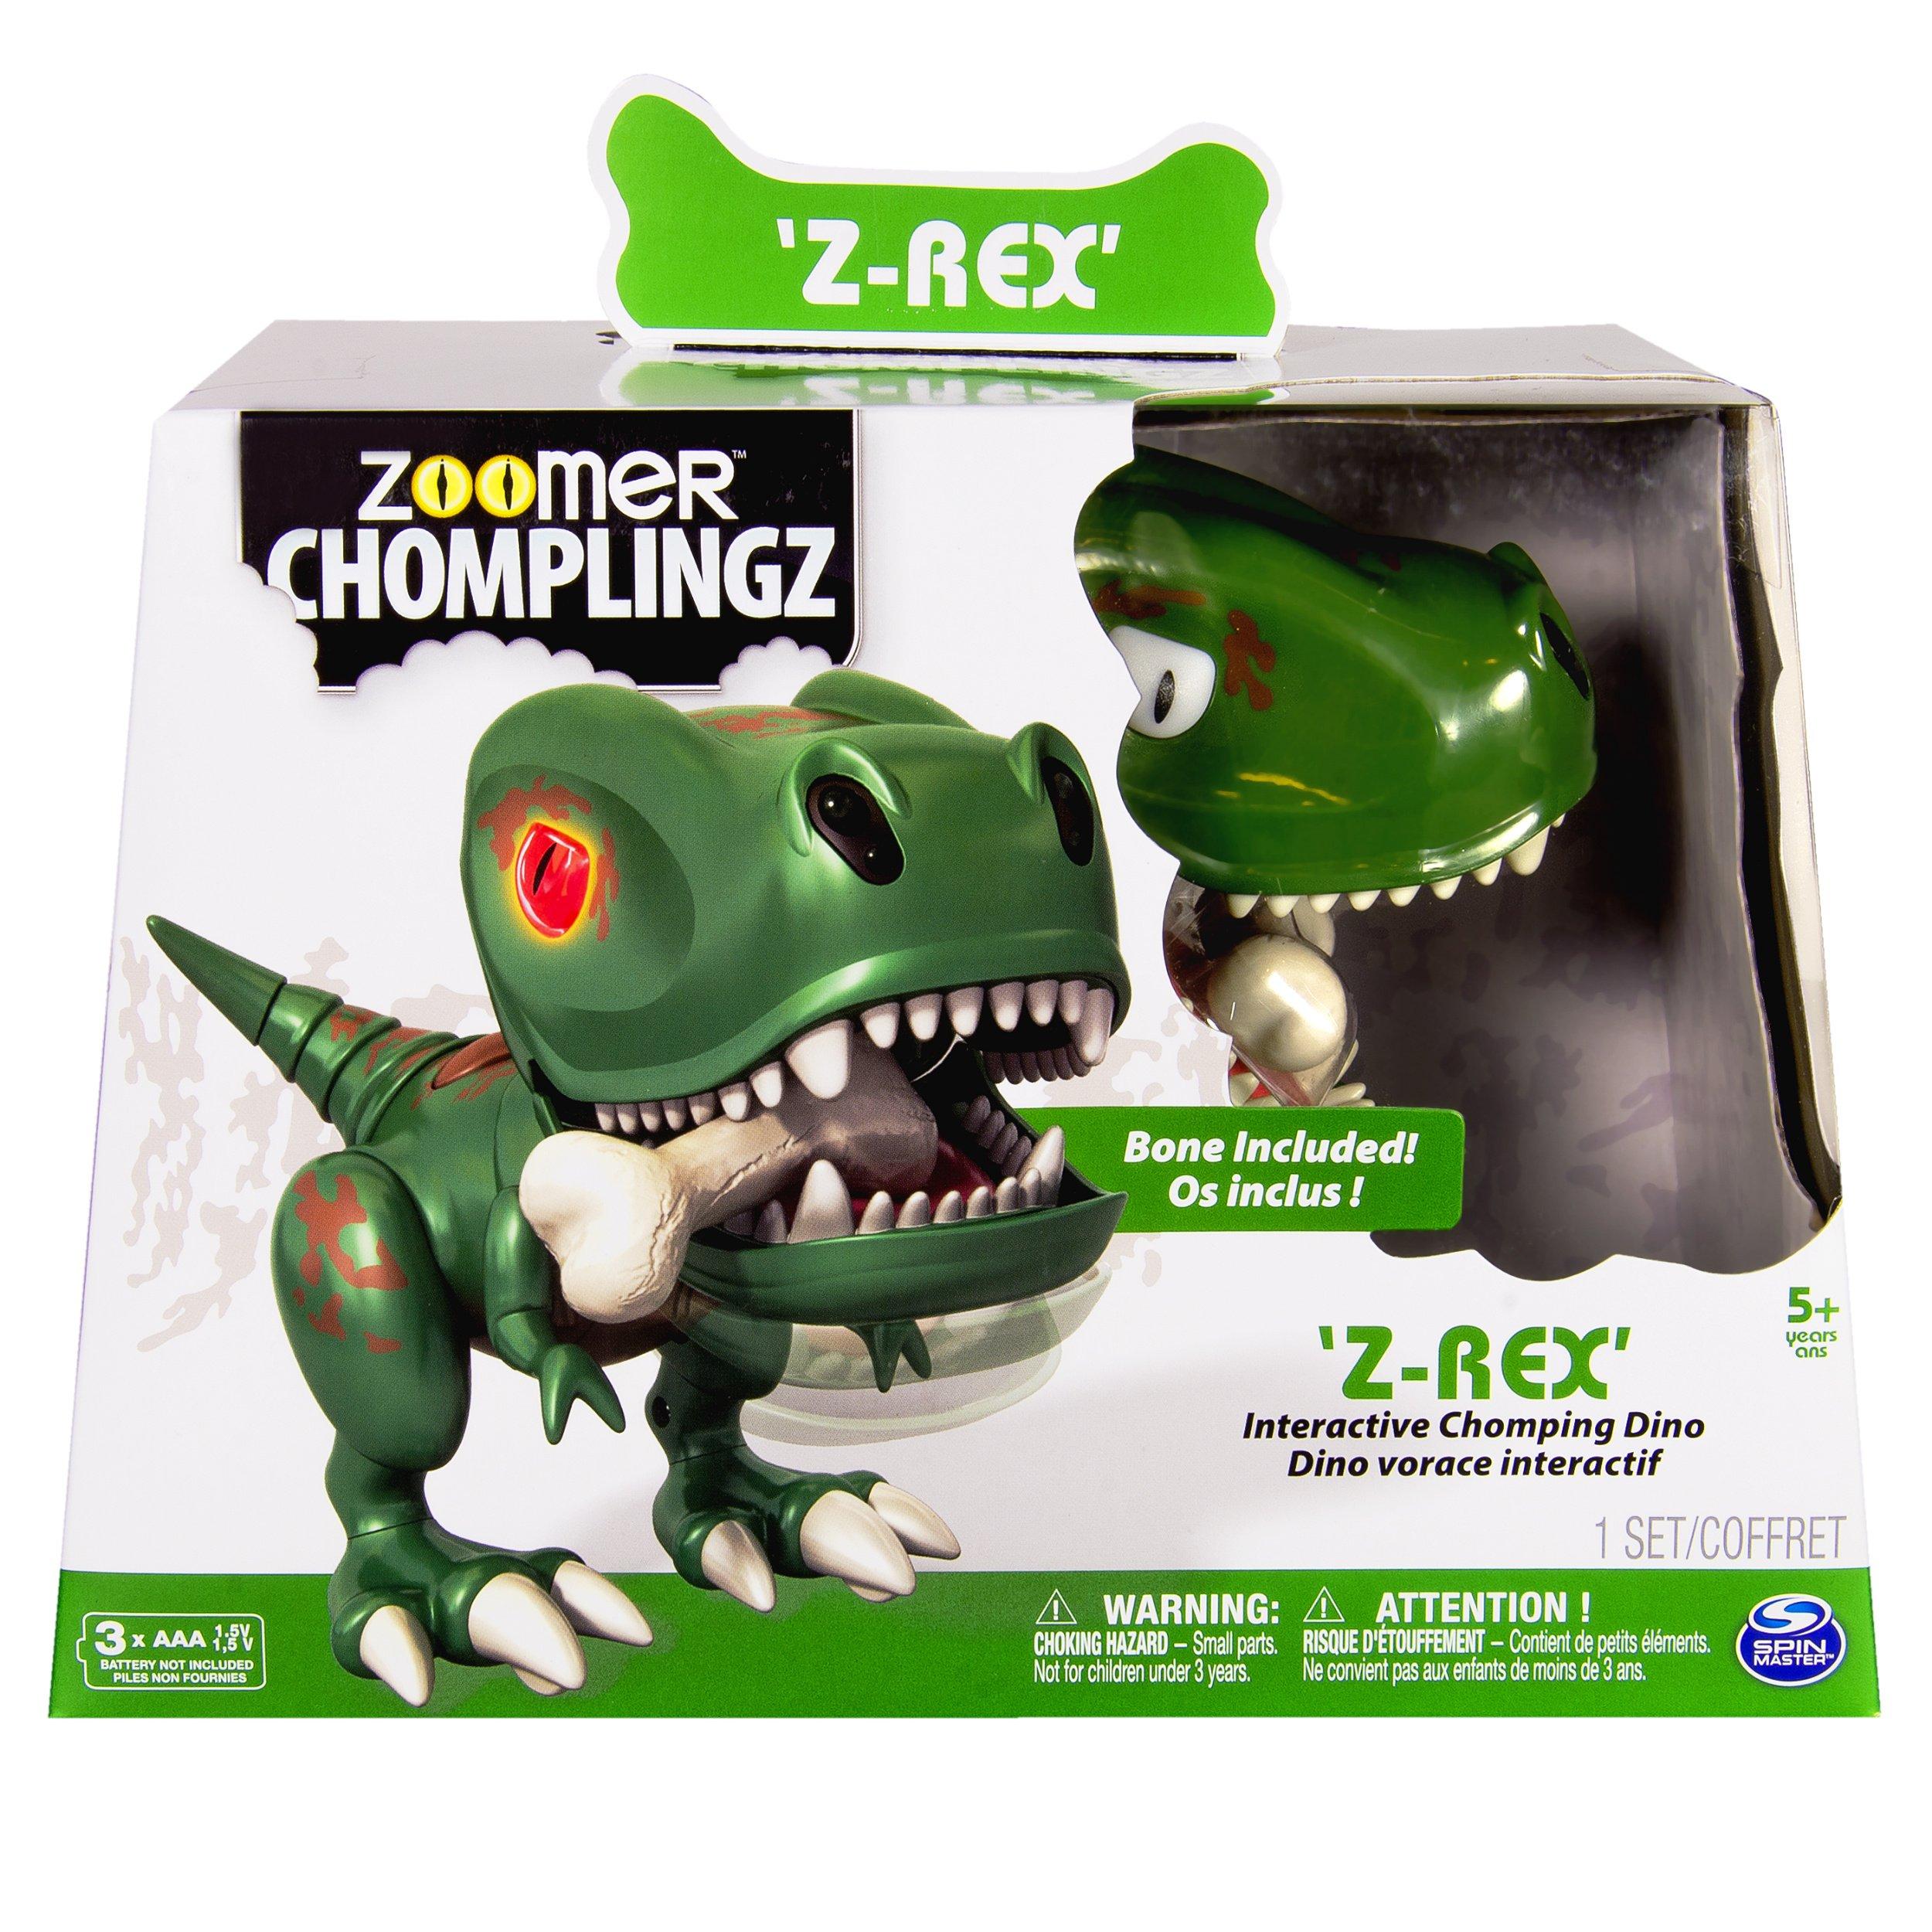 Zoomer Chomplingz – Z-Rex Interactive Dinosaur by zoomer (Image #2)